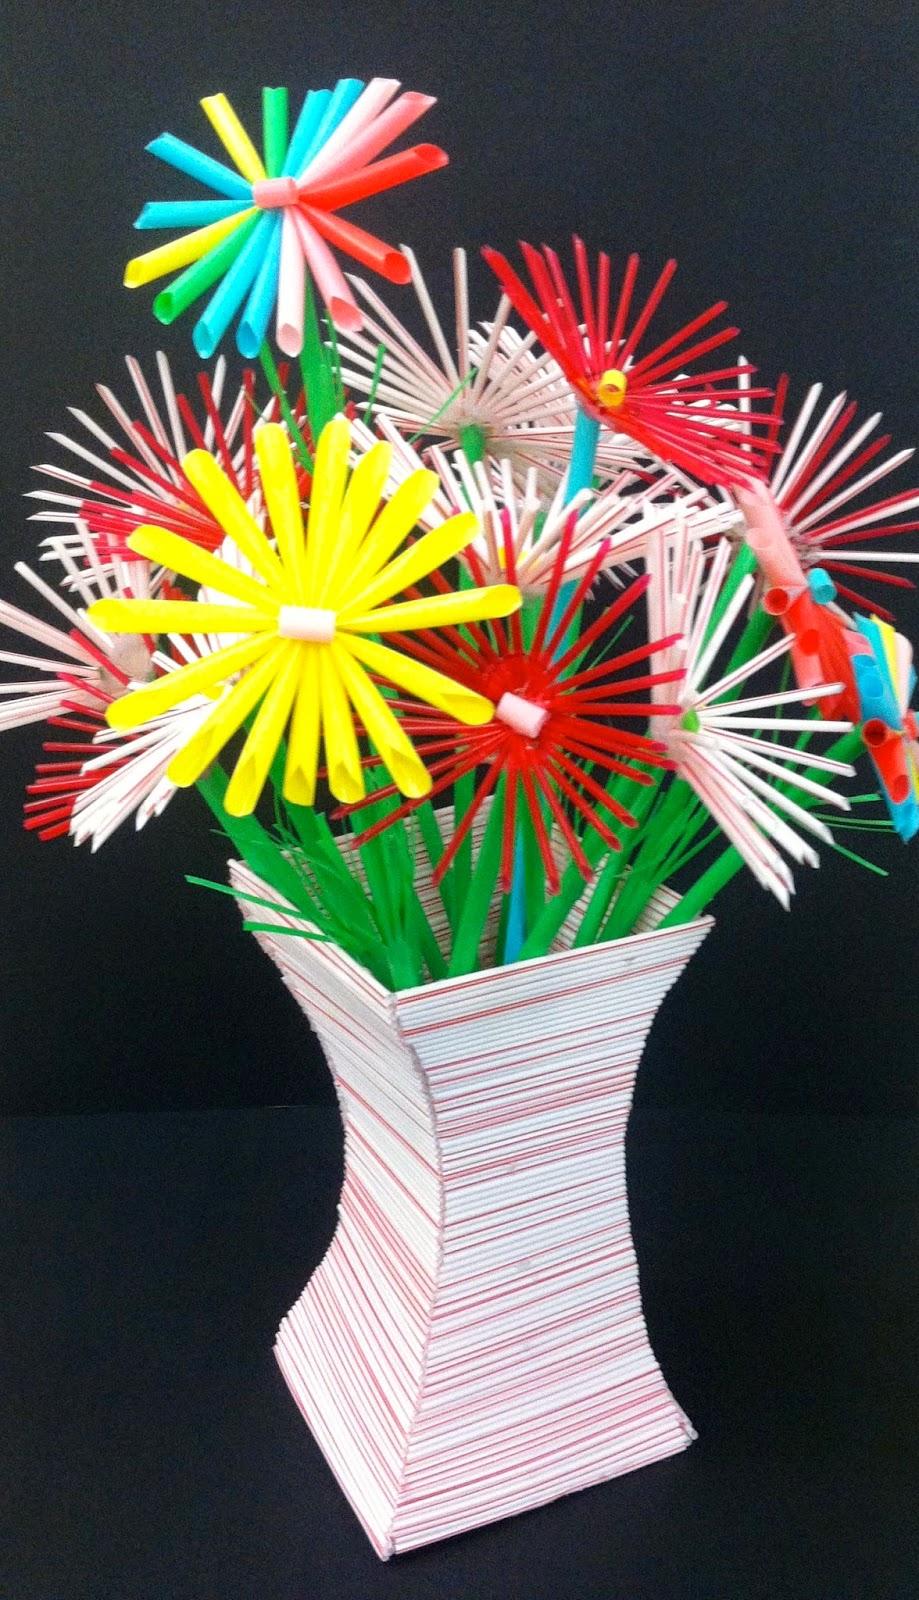 Kids Art Market Mass Straw Sculpture With Francesca Pasquali